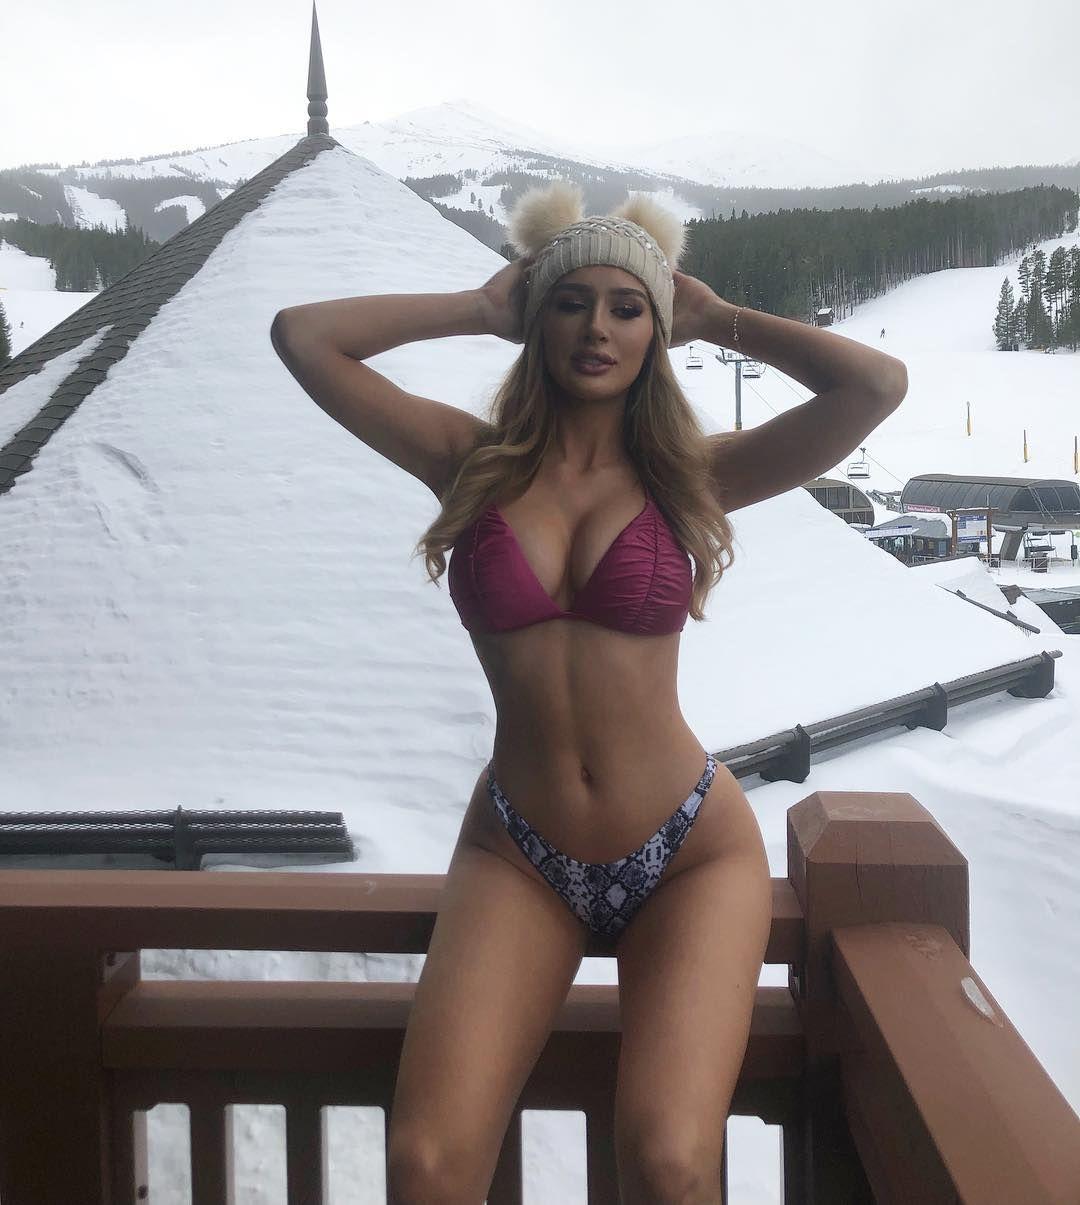 Freezing cold bikini model Completely share